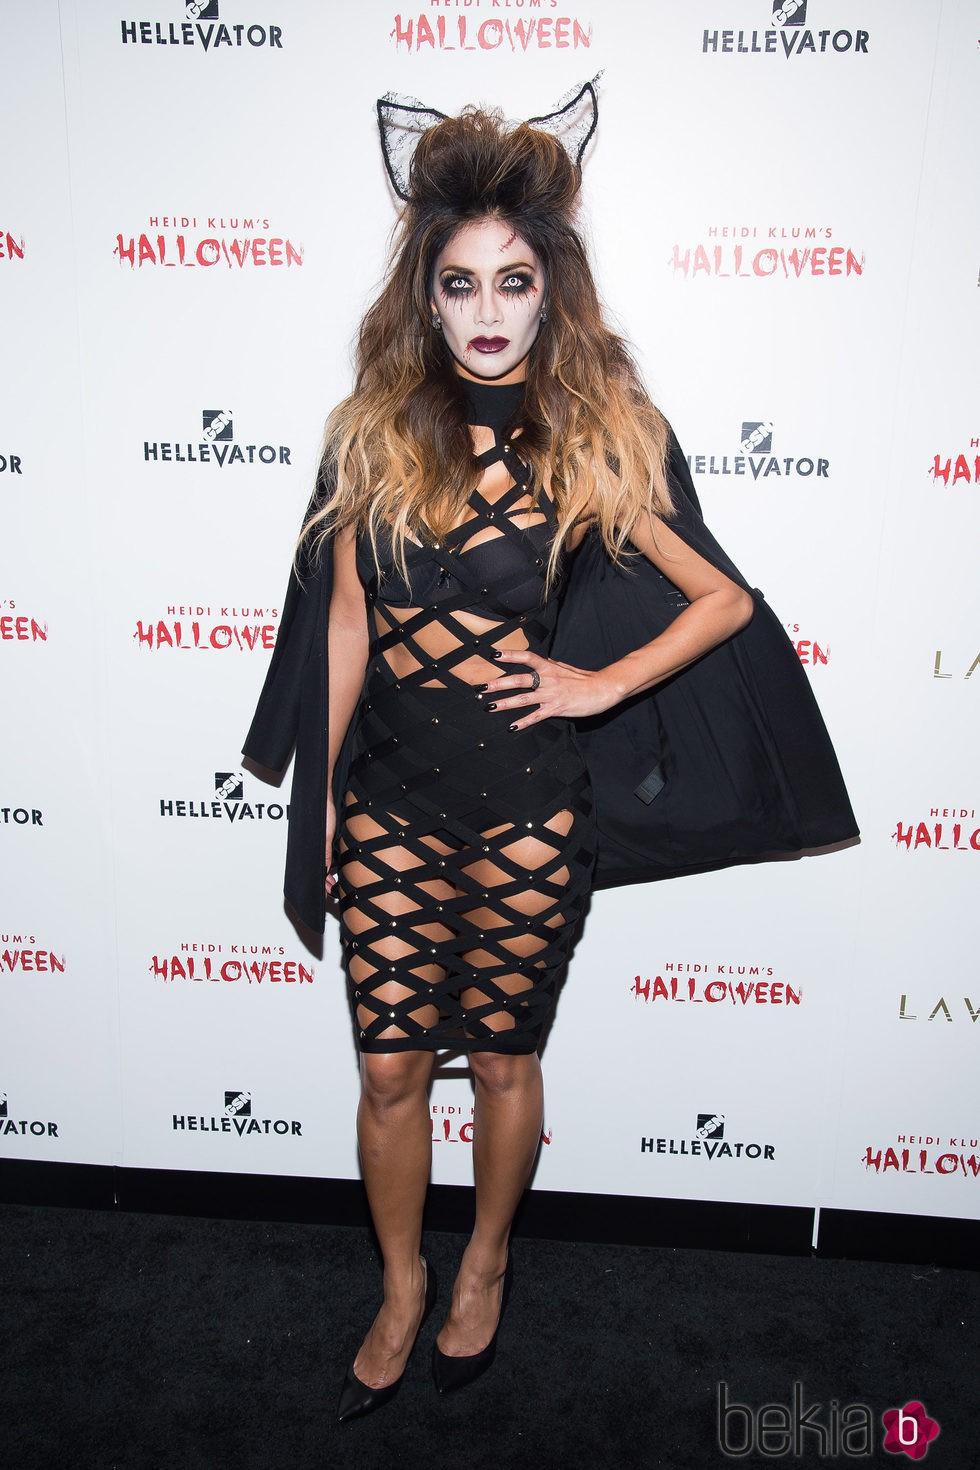 Nicole Scherzinger en la fiesta de Halloween 2015 de Heidi Klum